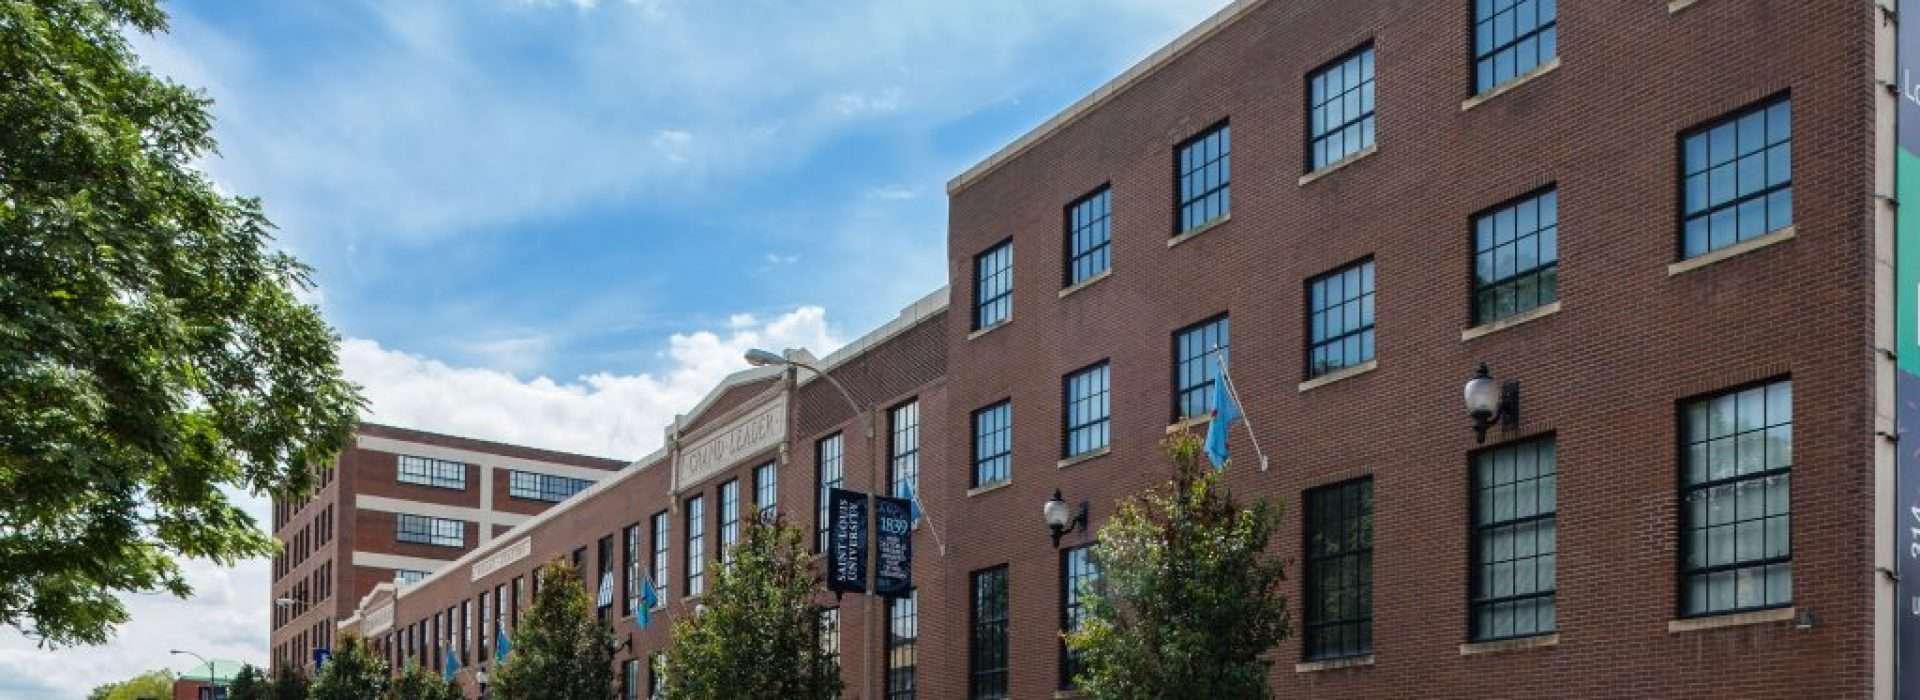 University-Lofts-LLC--1024x683